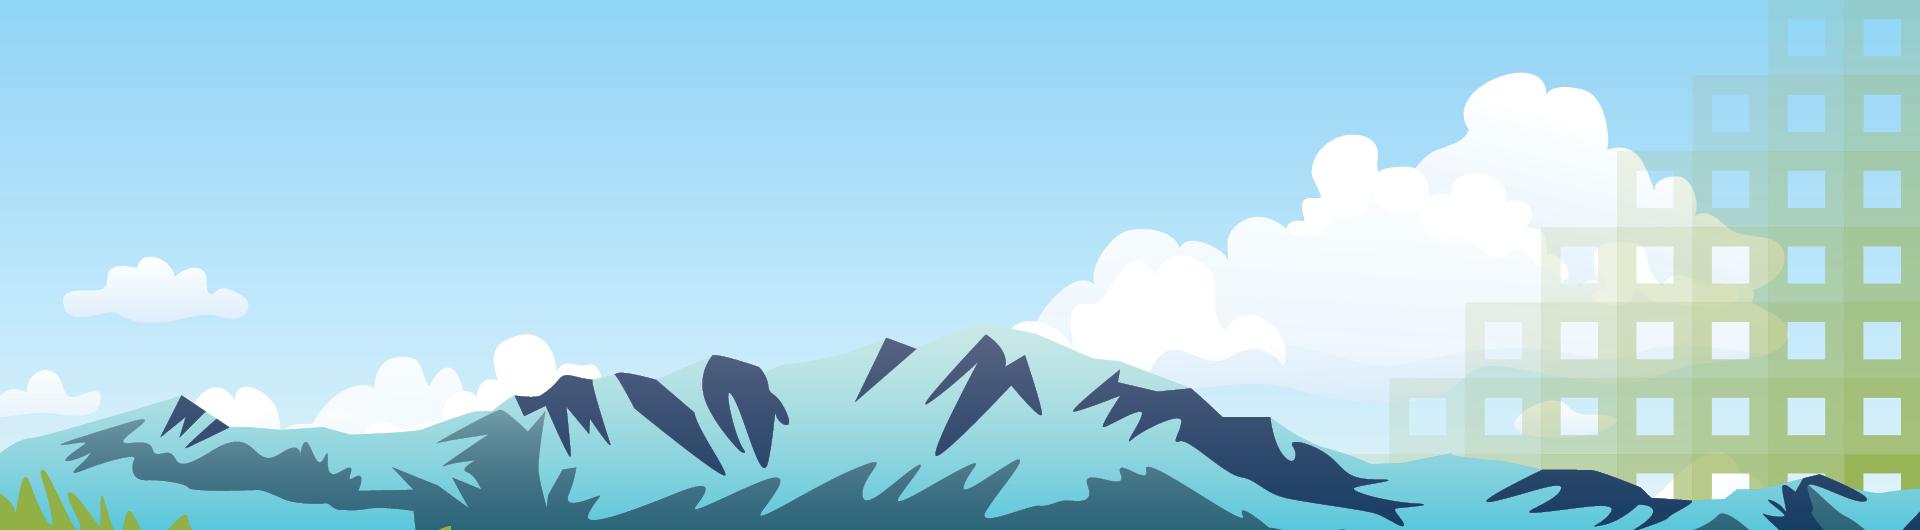 Front Range Fables - pikes peak illustration